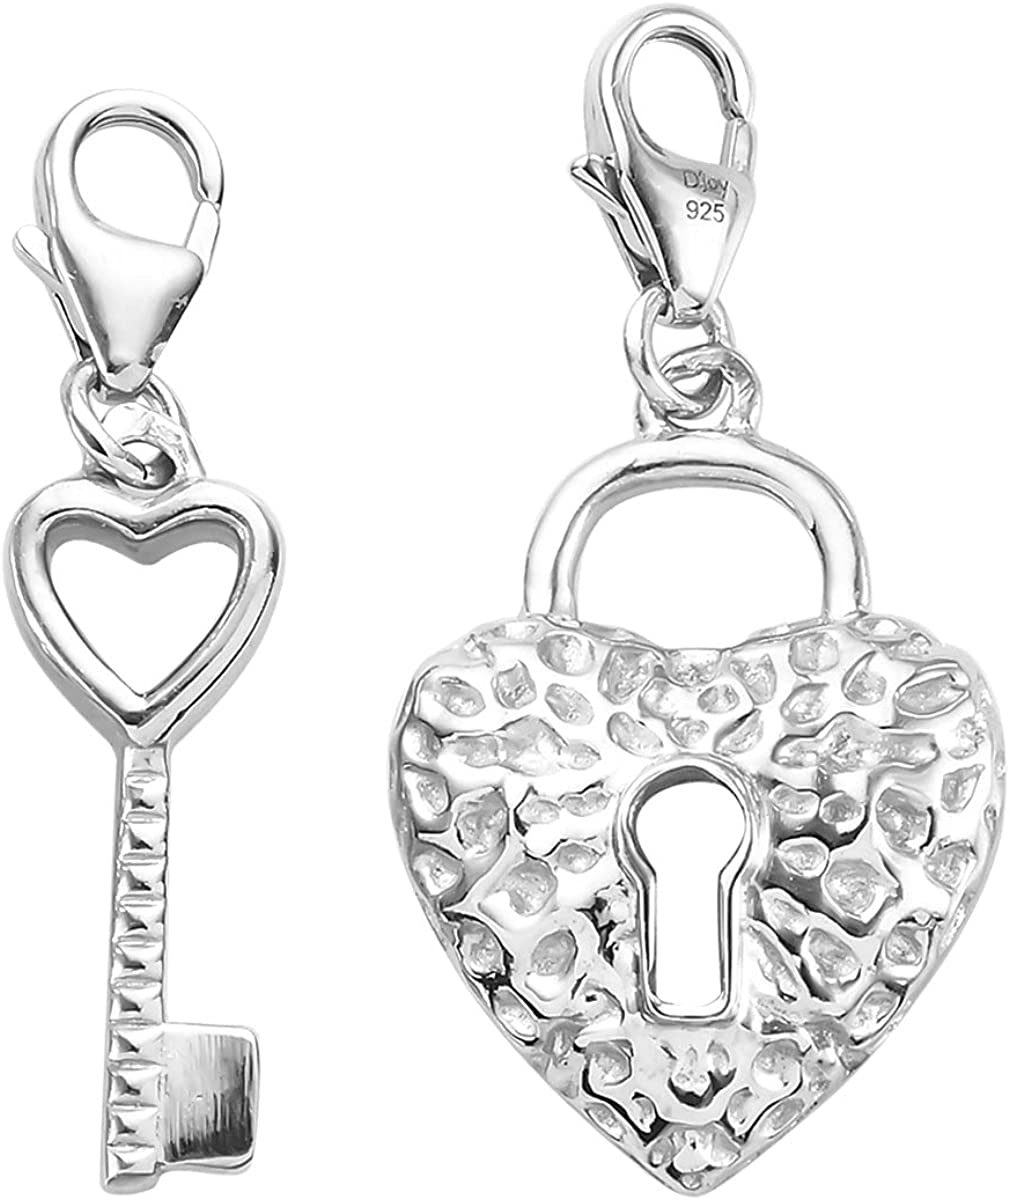 Shop LC High quality 925 Sterling Silver Platinum Charm Key Plated [Alternative dealer] Jewel Lock